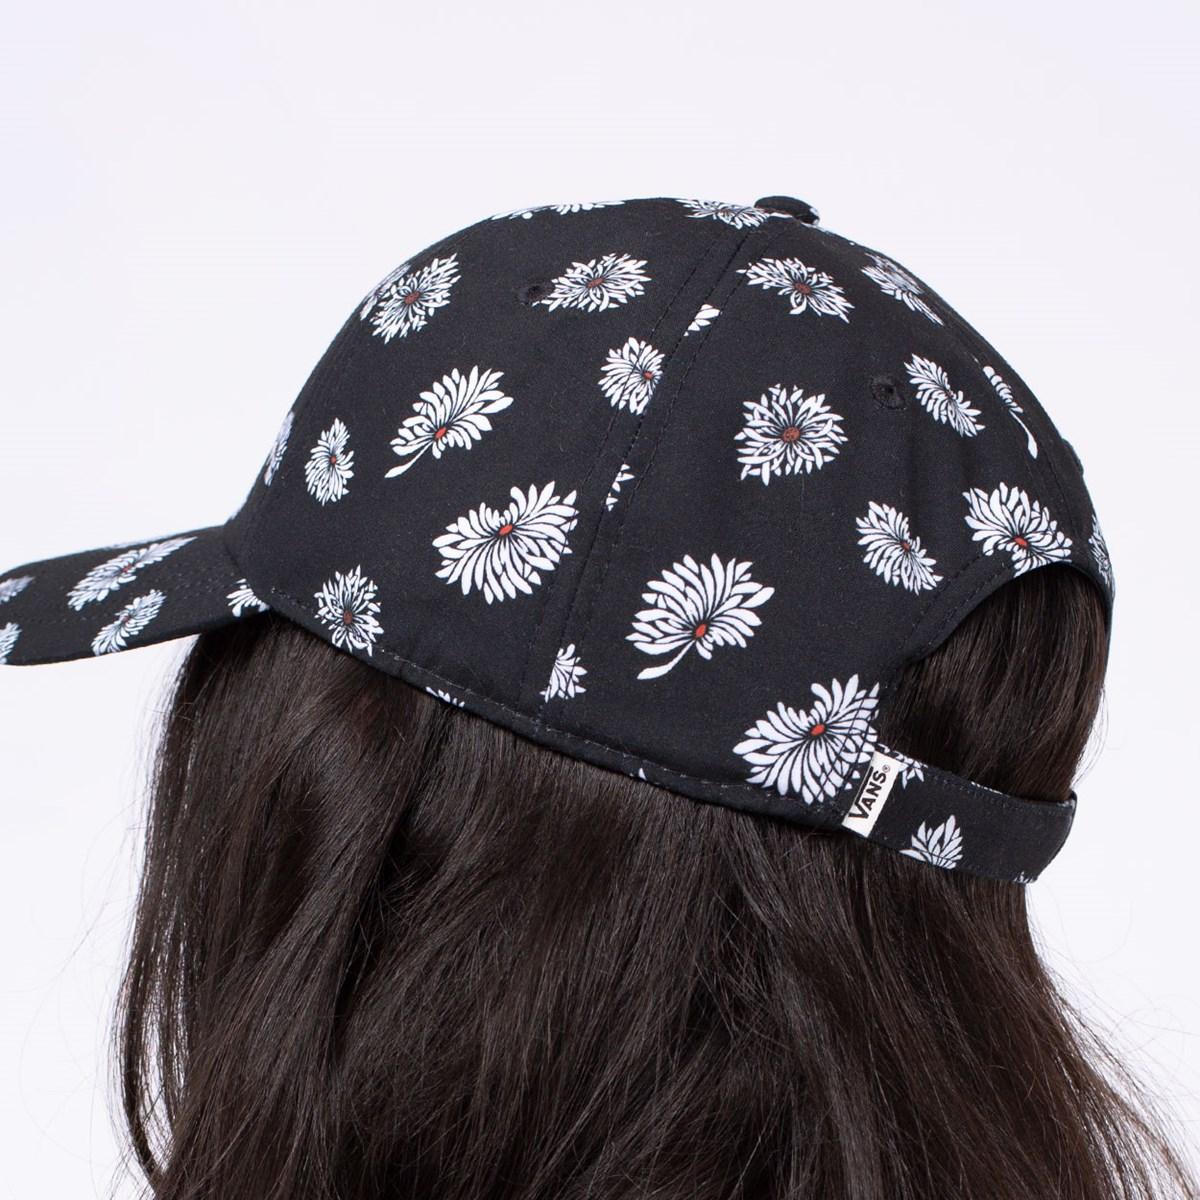 Boné Vans Court Side Printed Hat Imperfect Floral  VN0A34GRZLE